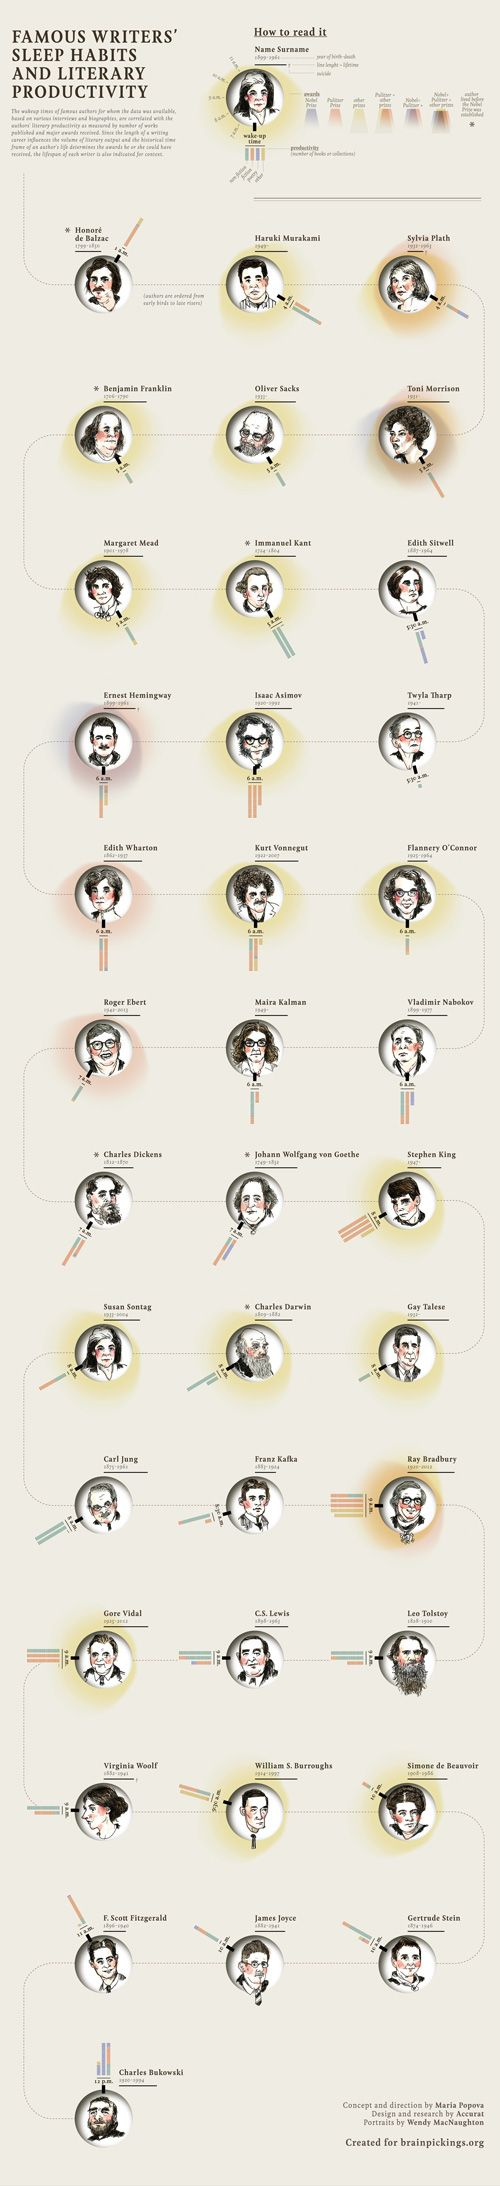 Famous Writers' Sleep Habits vs. Literary Productivity, Visualized